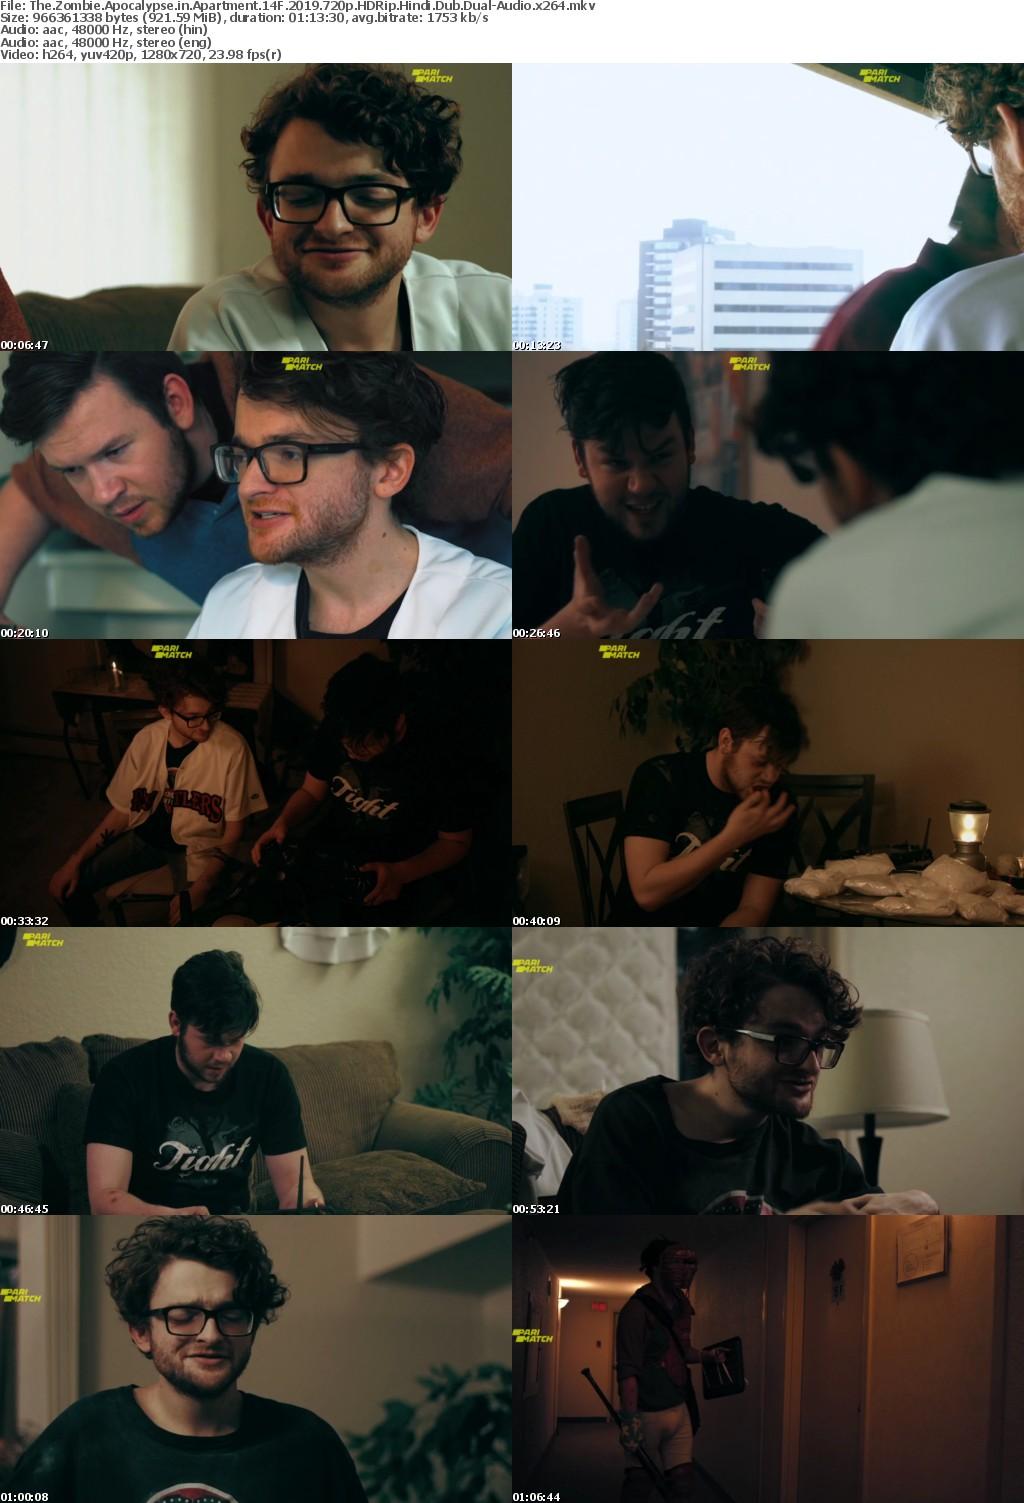 The Zombie Apocalypse in Apartment 14F (2019) 720p HDRip Hindi-Dub Dual-Audio x264